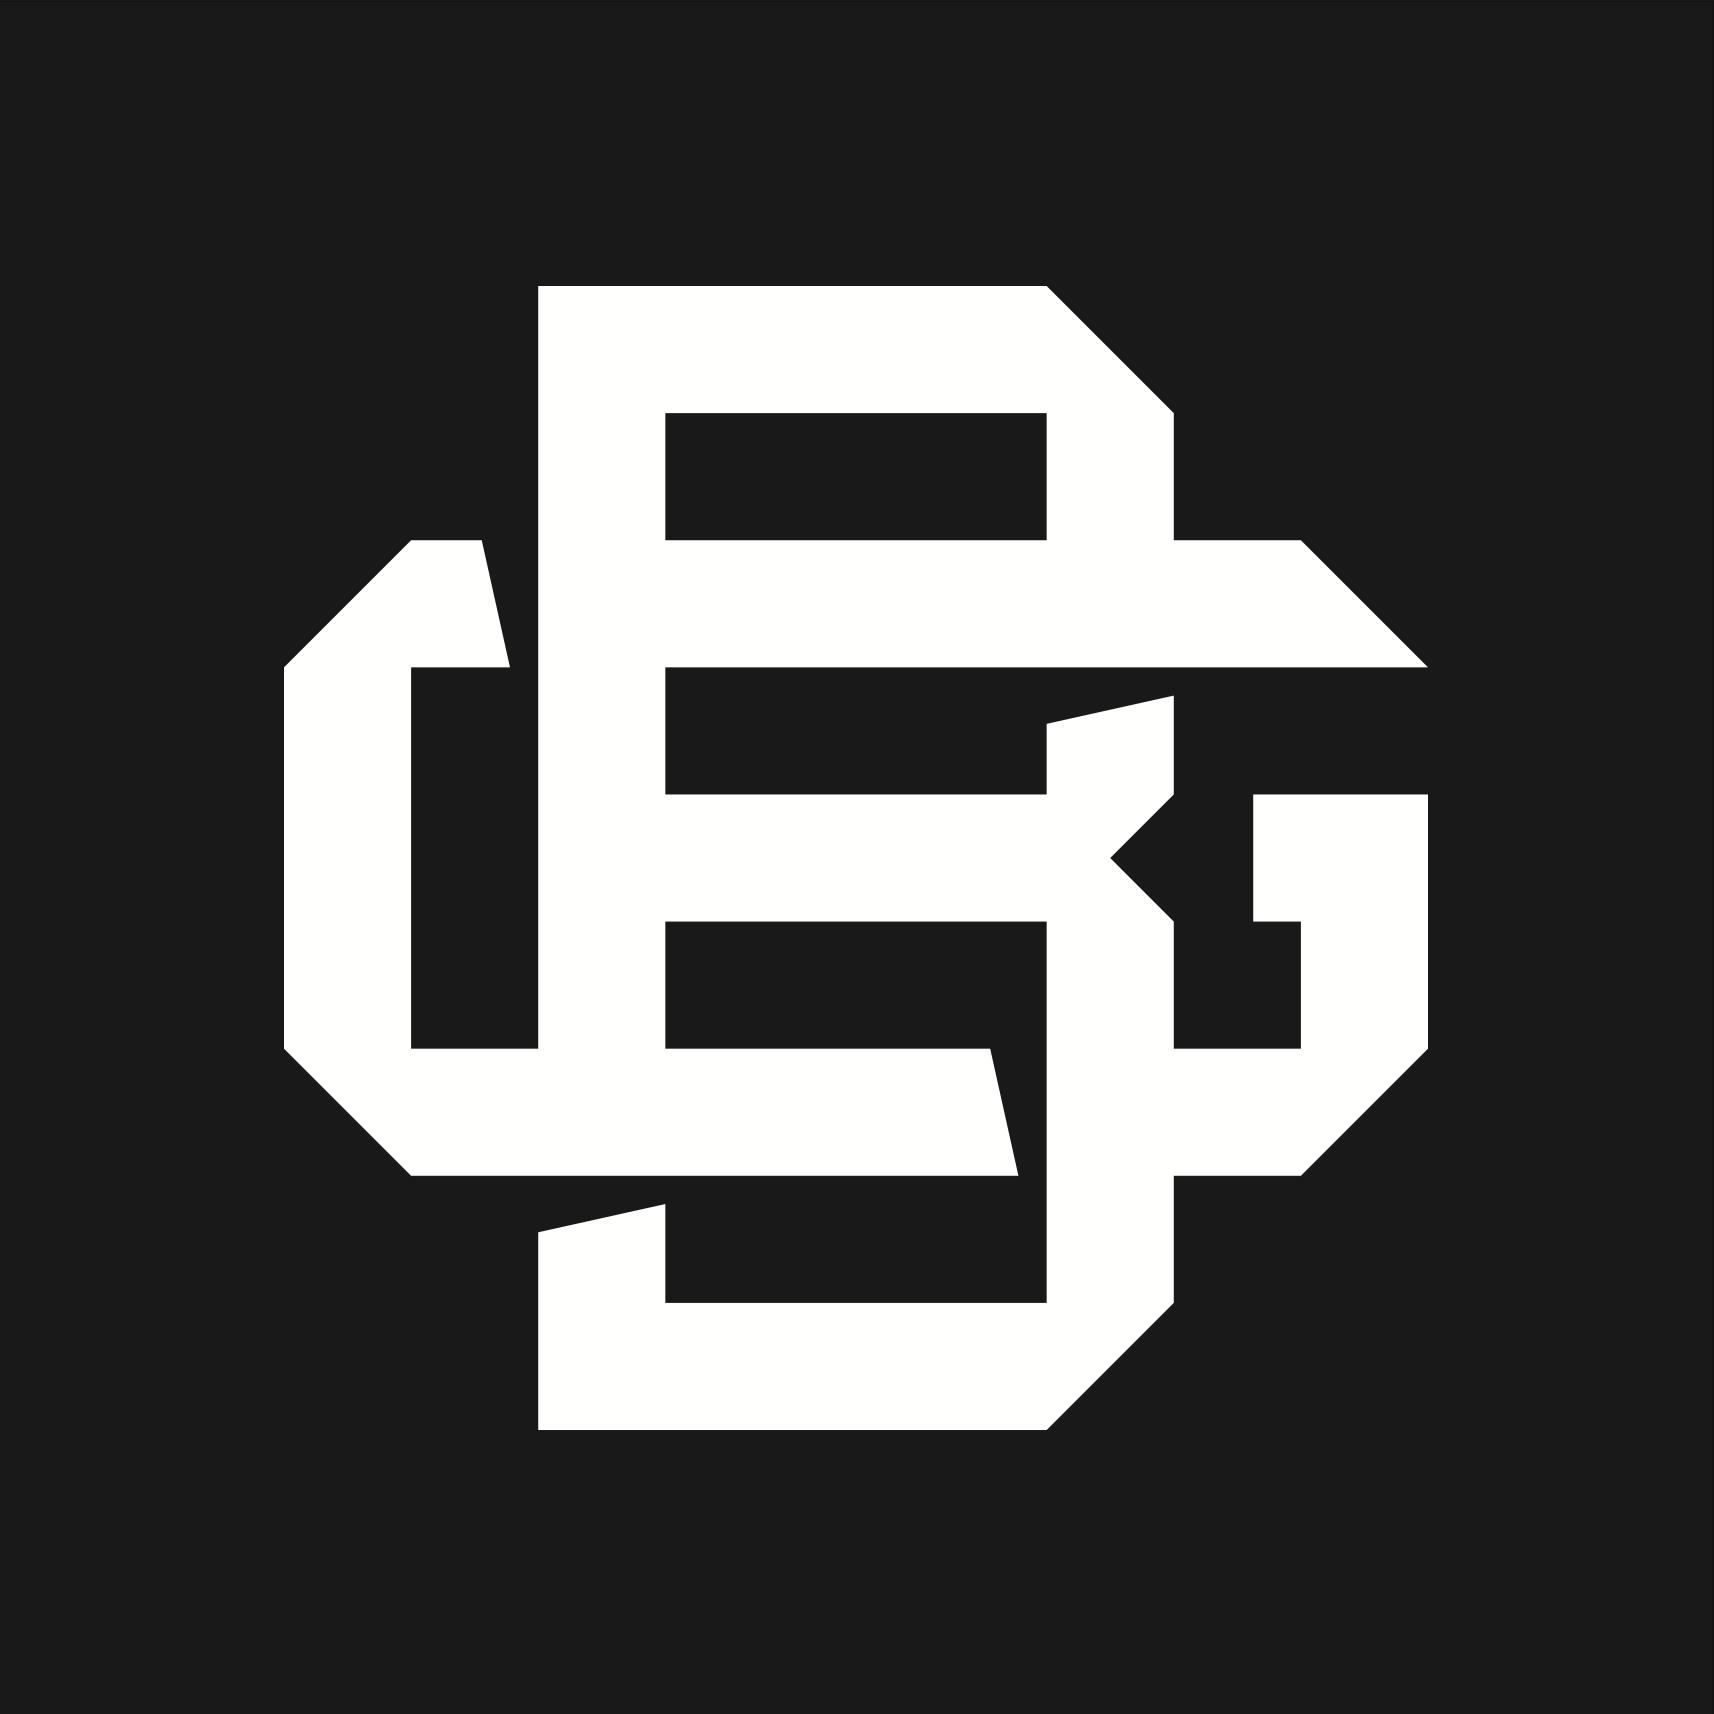 Brenden Goodcuff Design Co. on LogoLounge